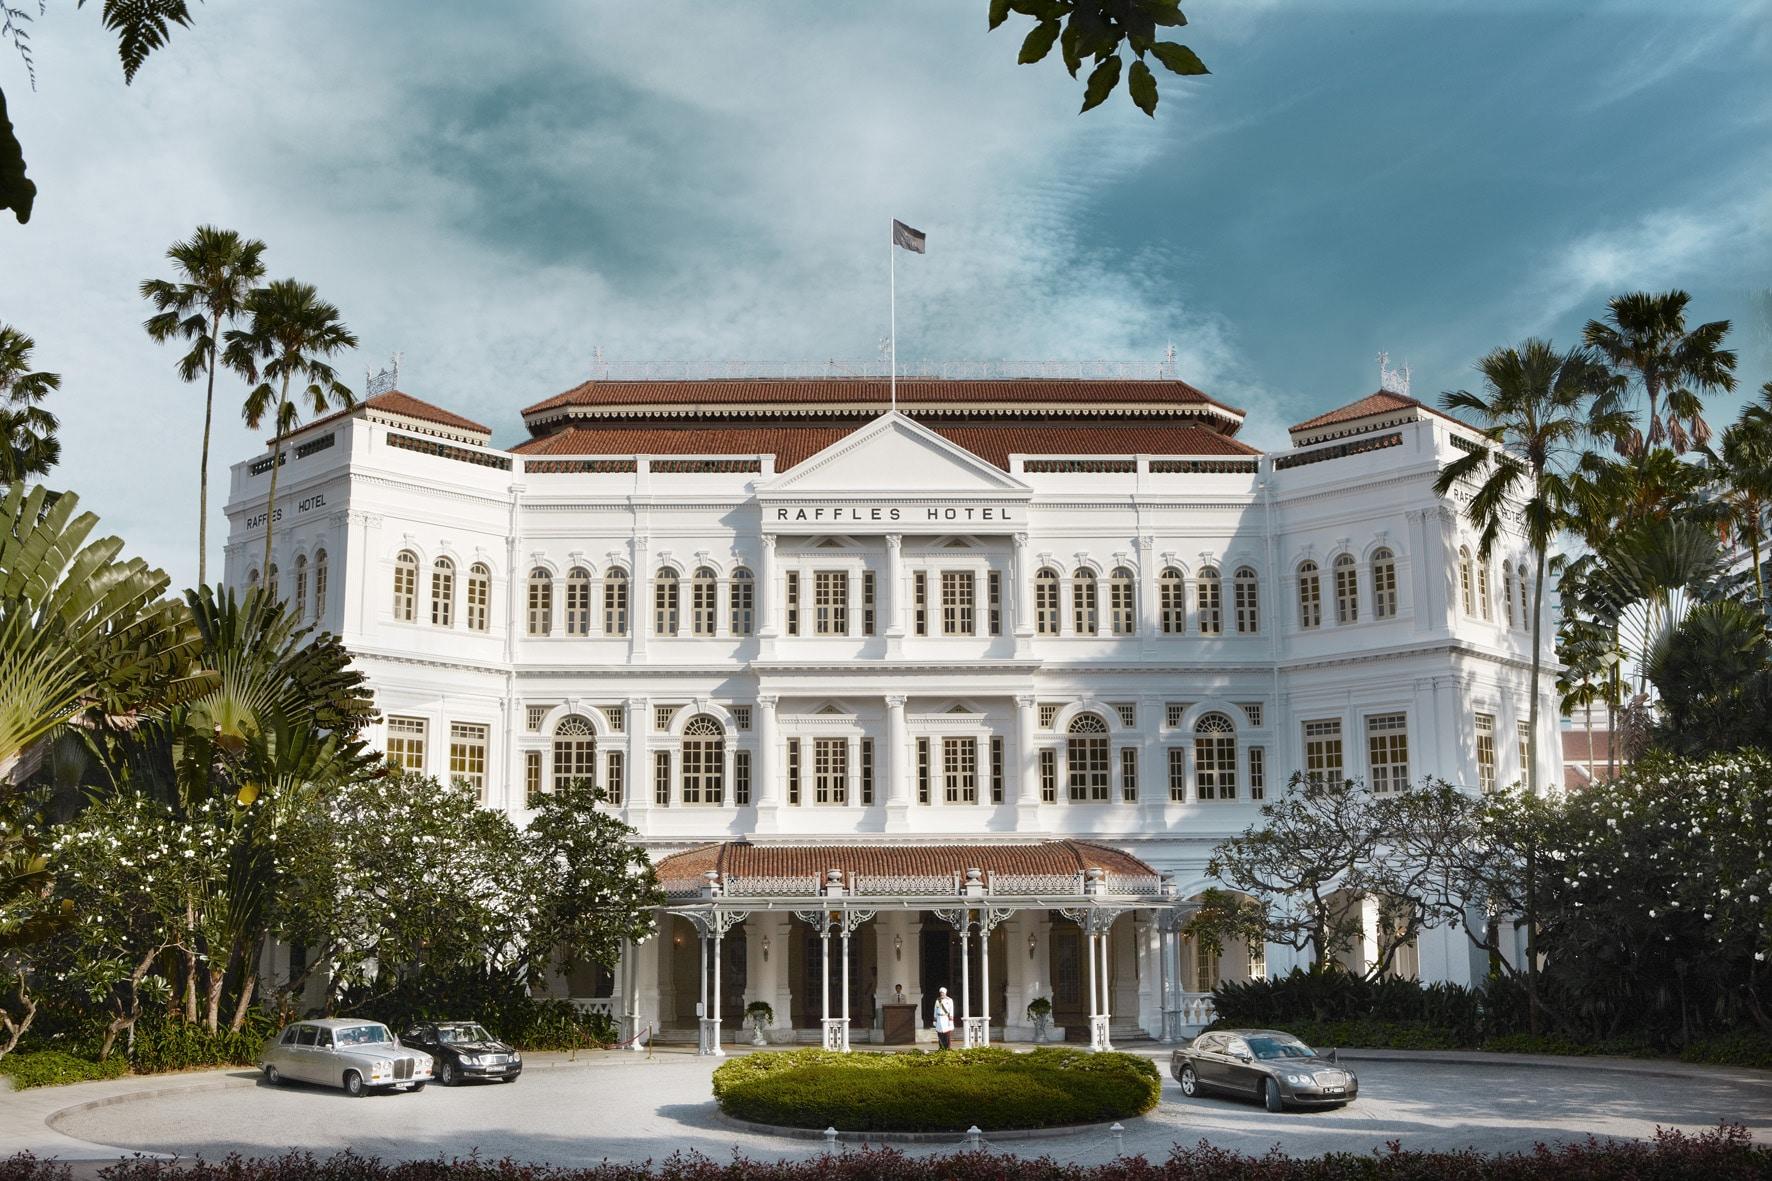 Raffles Hotel Singapore Hotel Facade 1